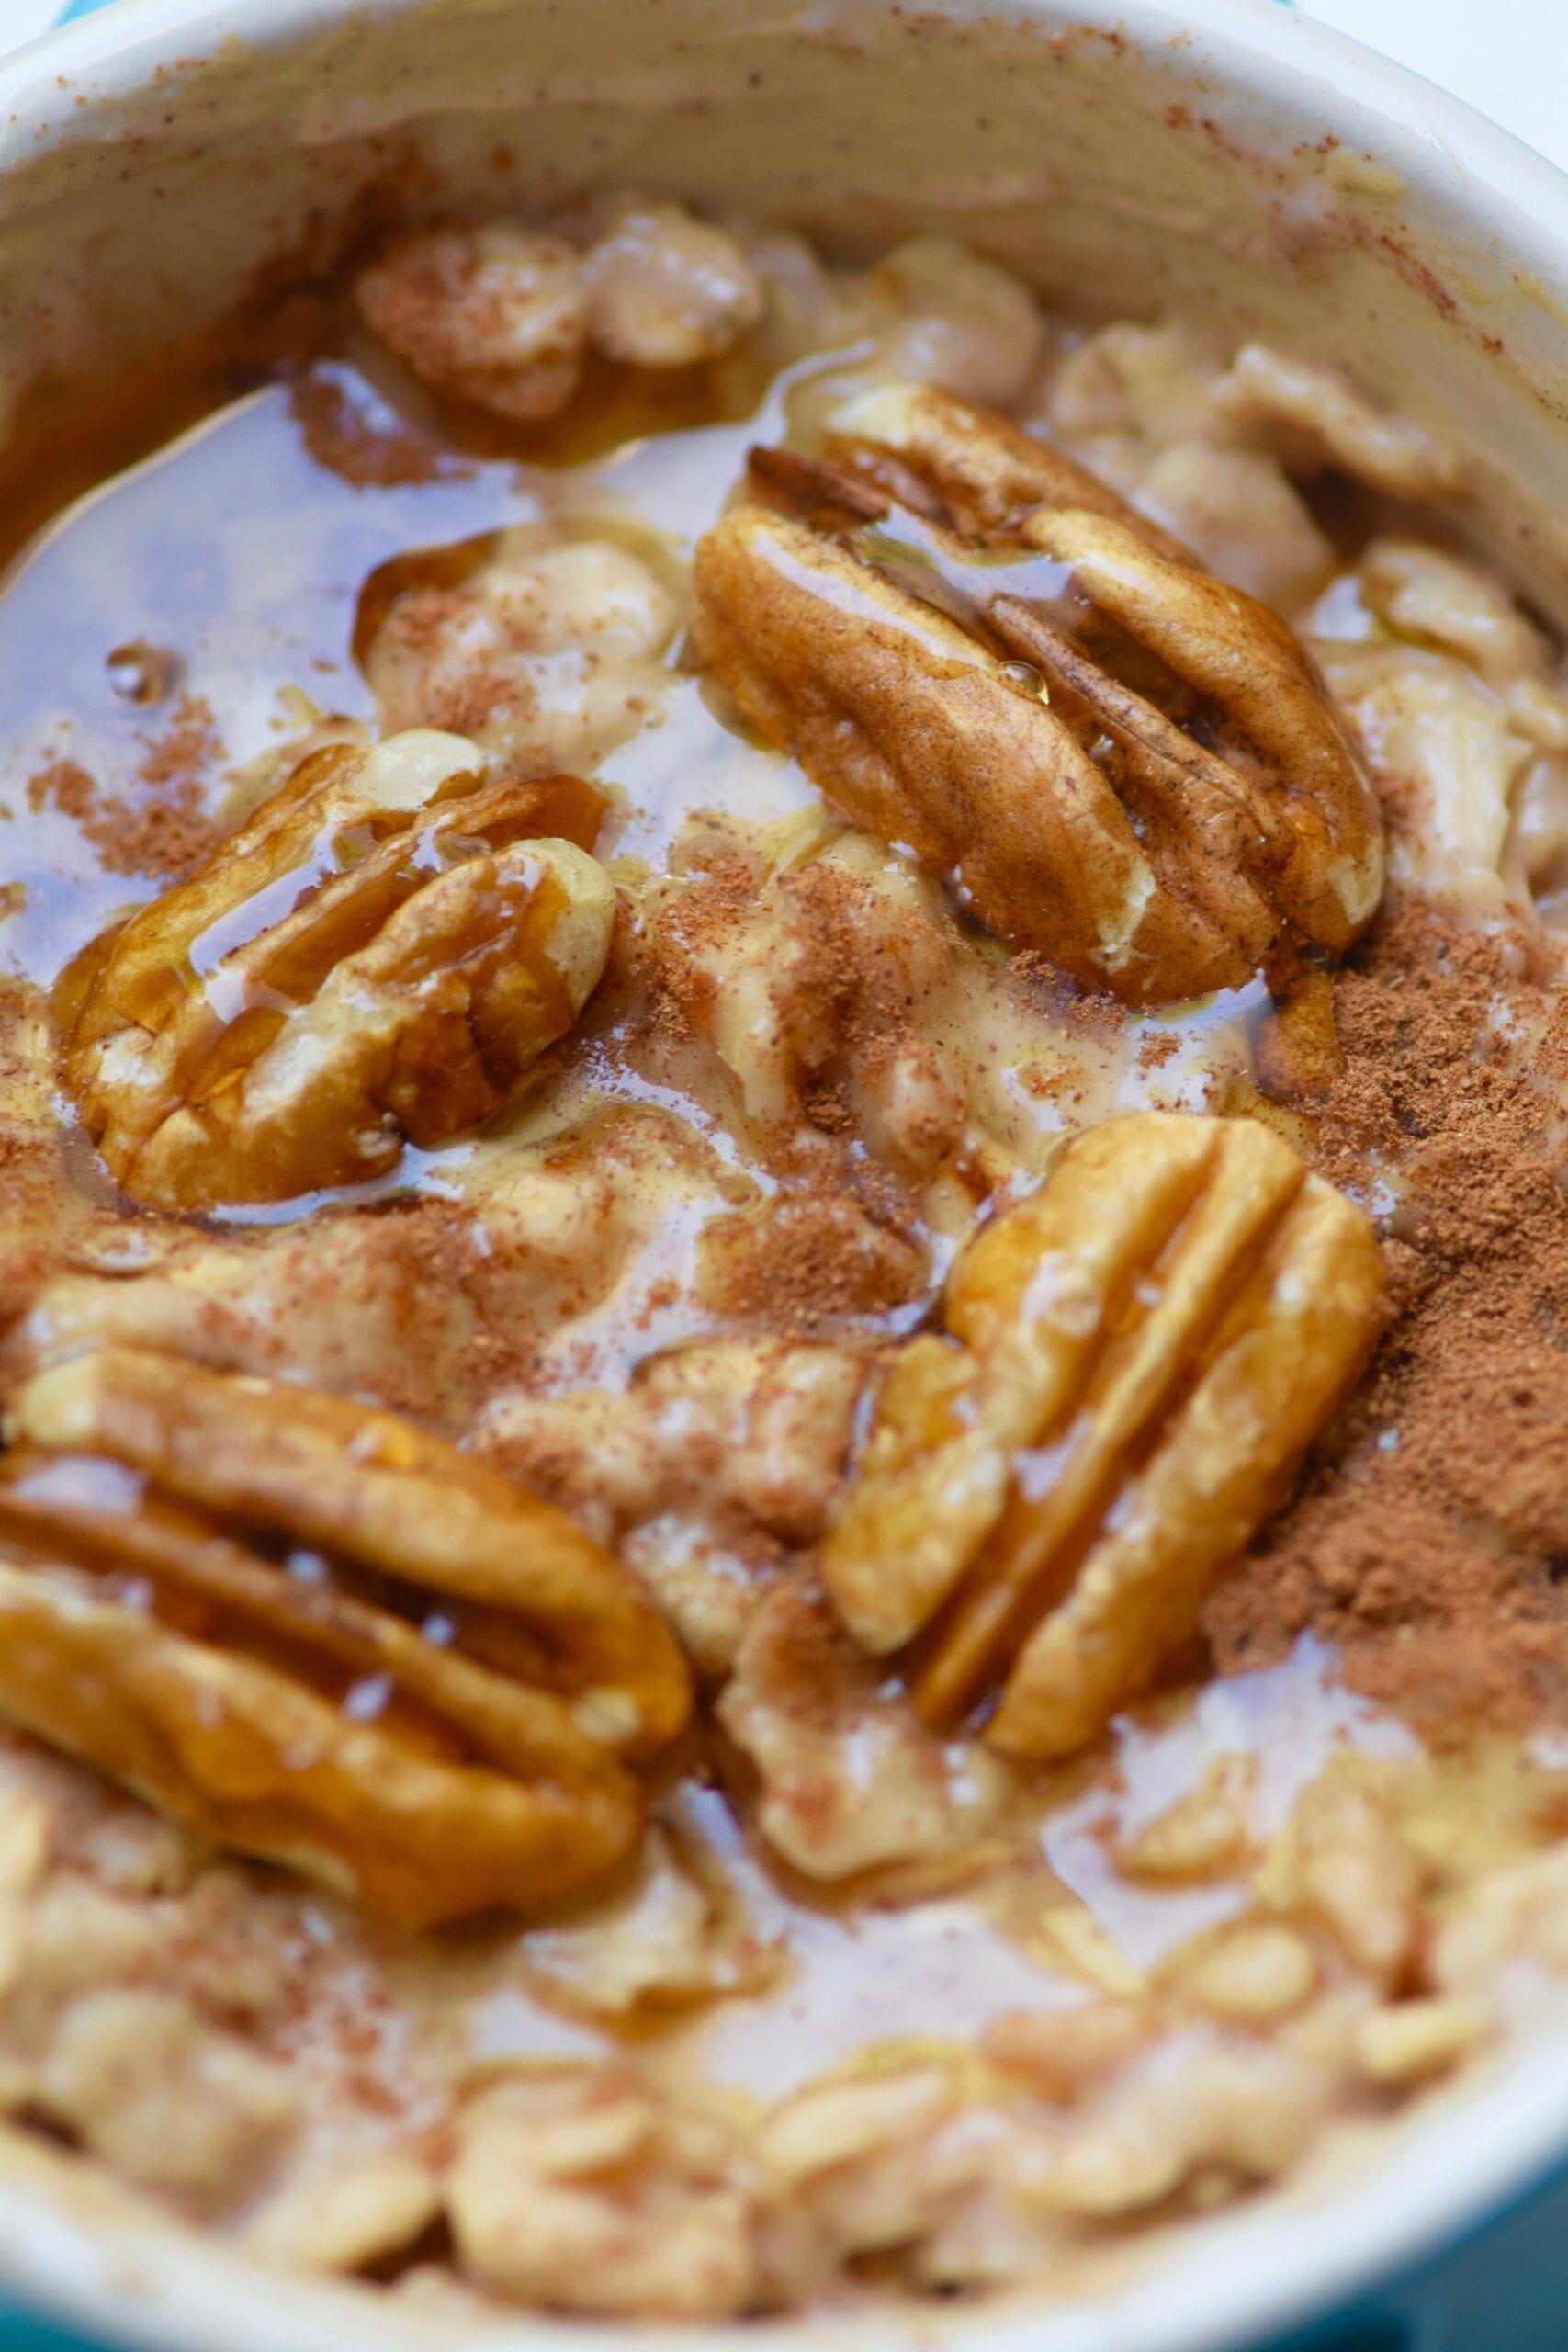 Pecan overnight oatmeal